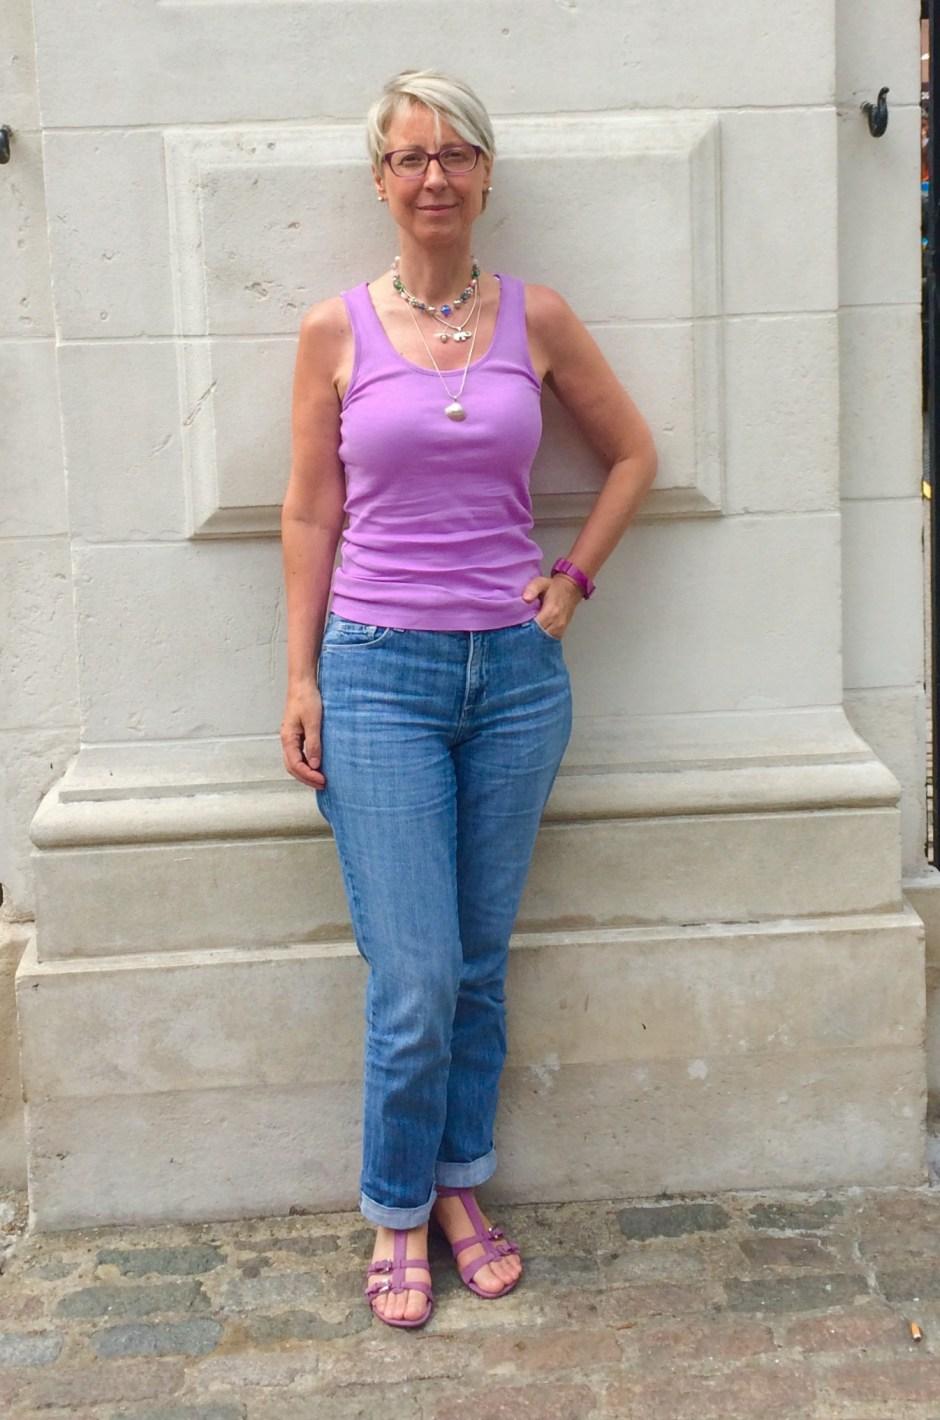 M&S violet vest Fabrickated